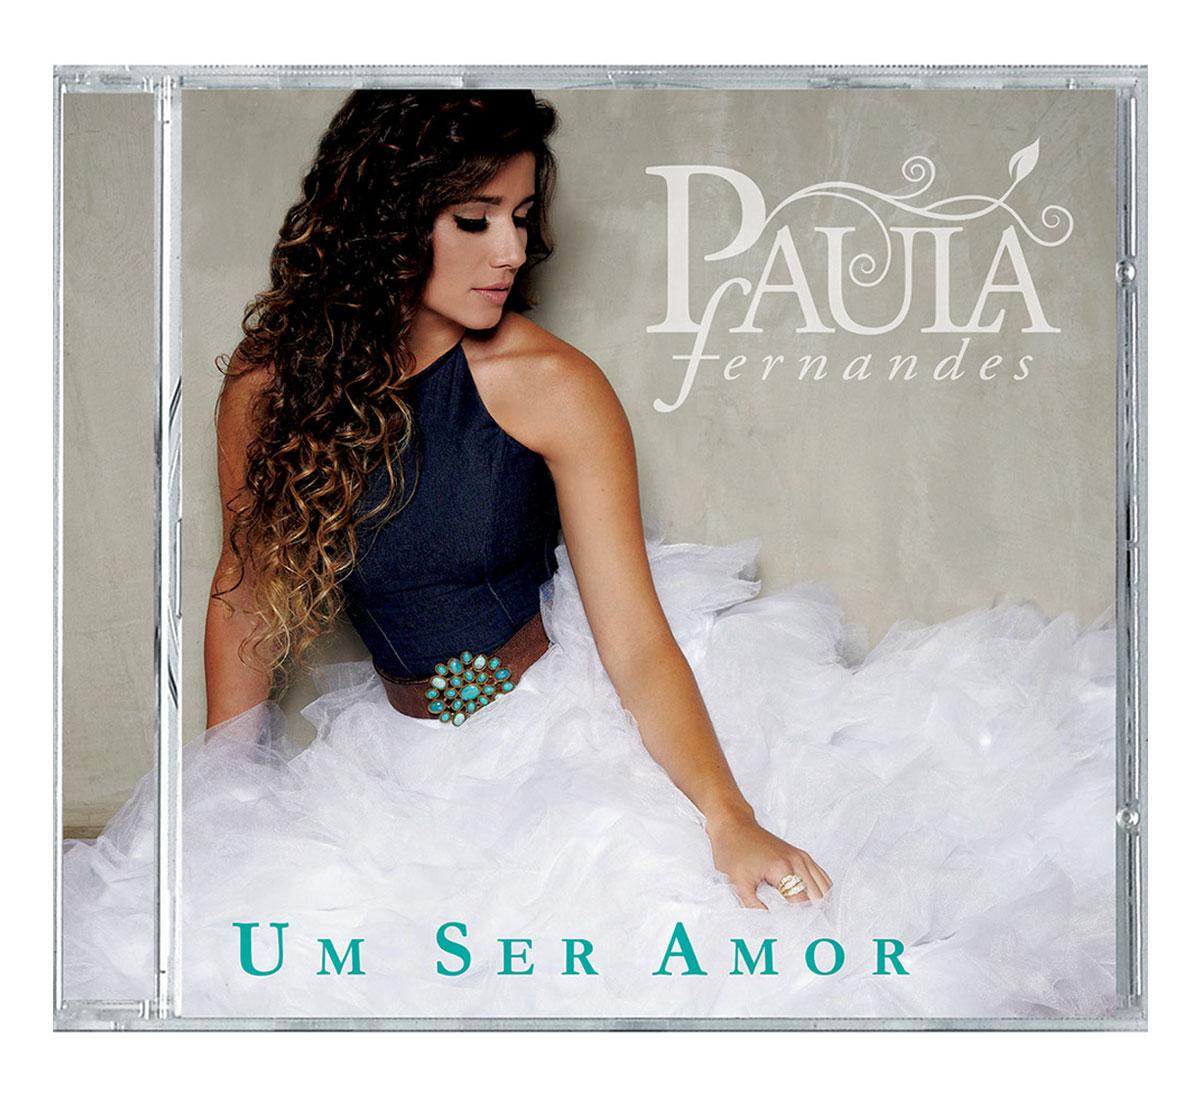 EP Paula Fernandes Um Ser Amor